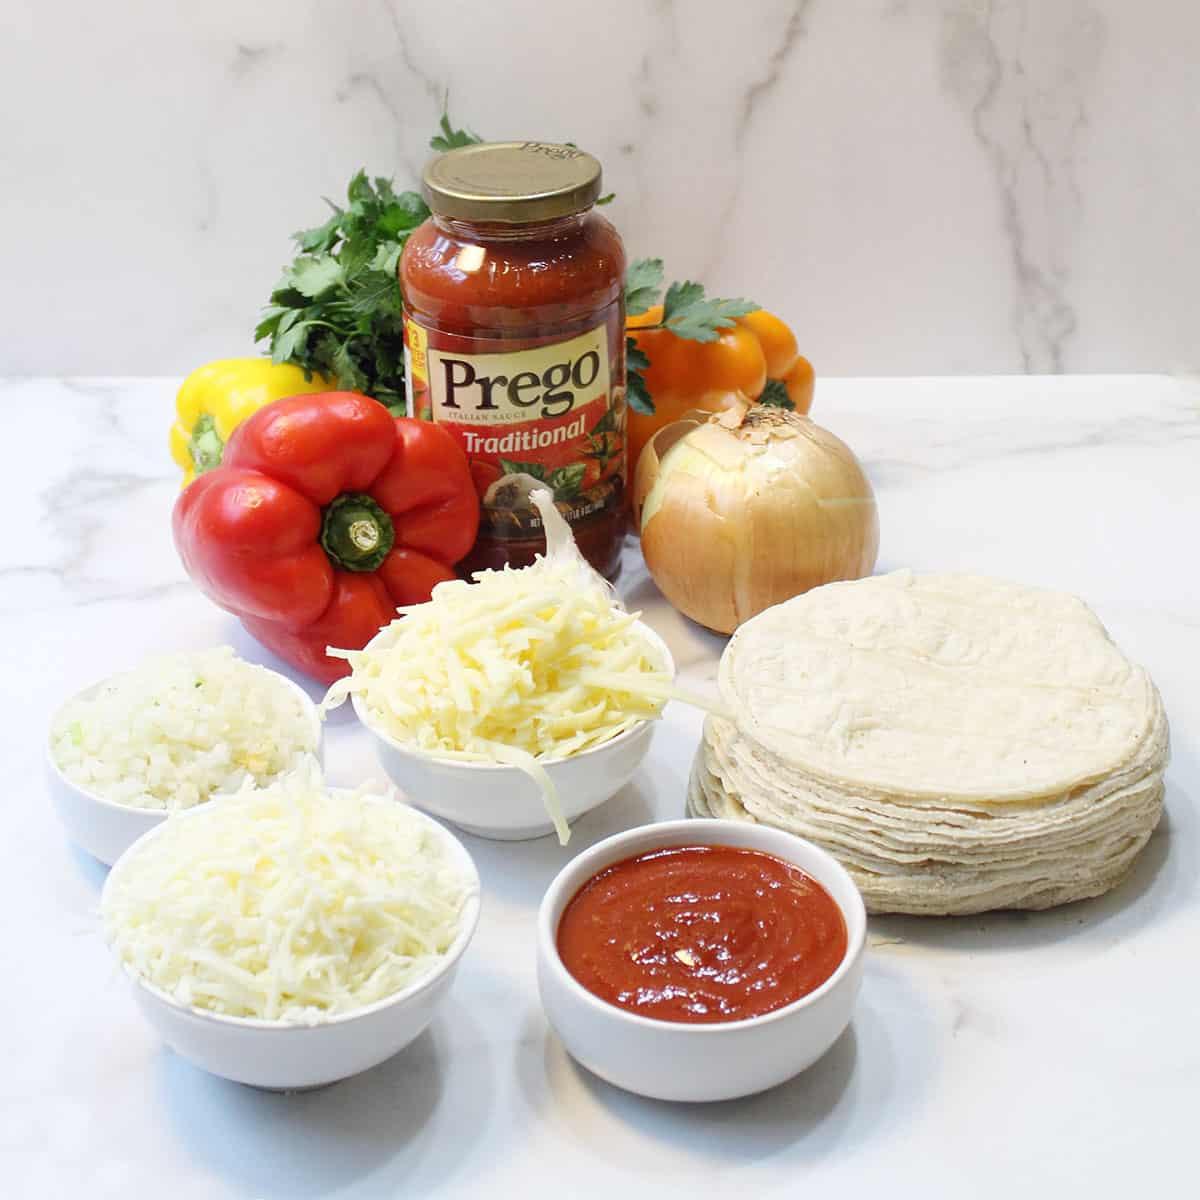 Ingredients for Turkey Frito Pie on white table.